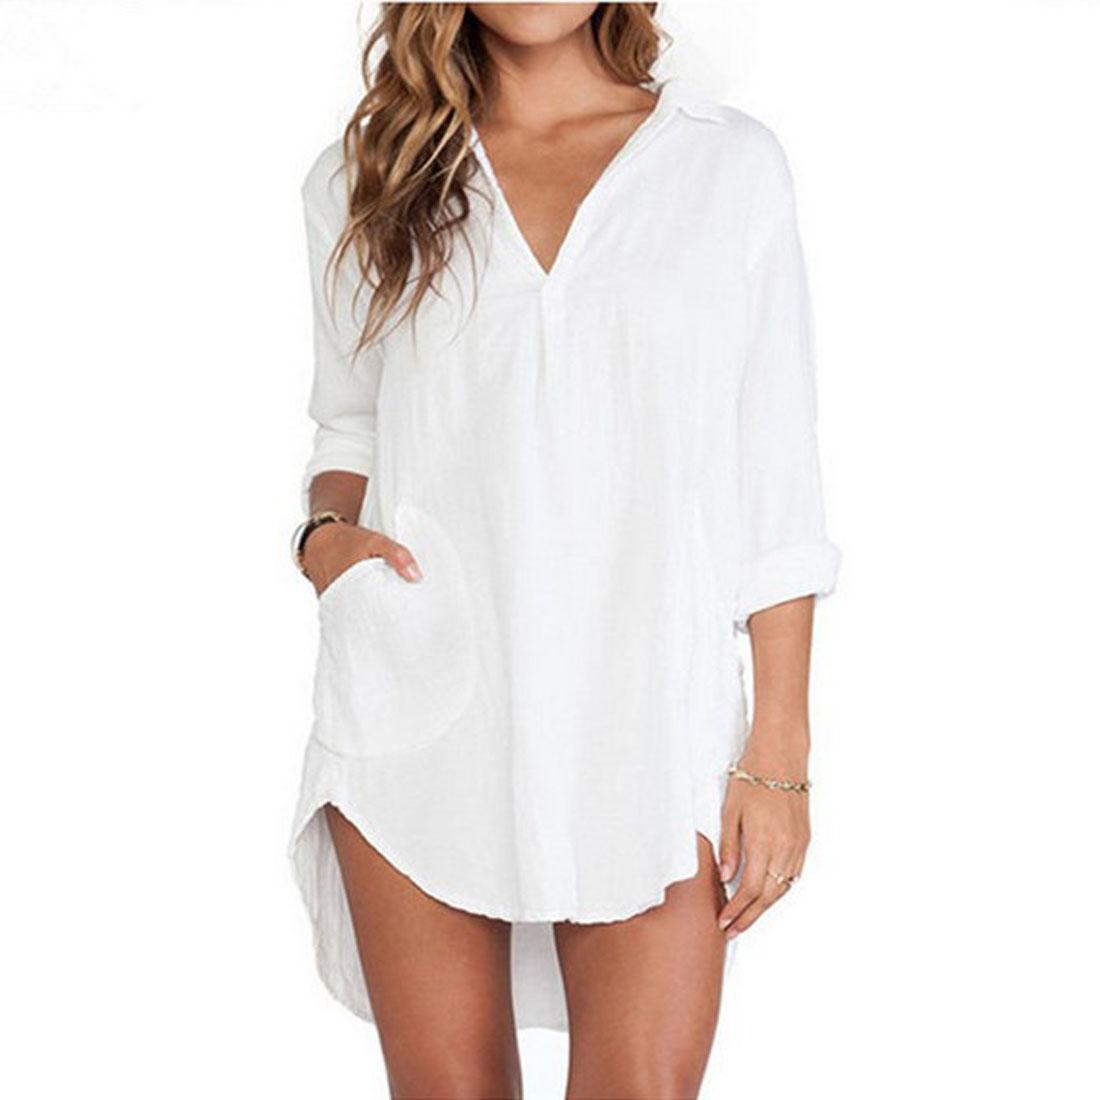 Women Blouse White Pocket 32